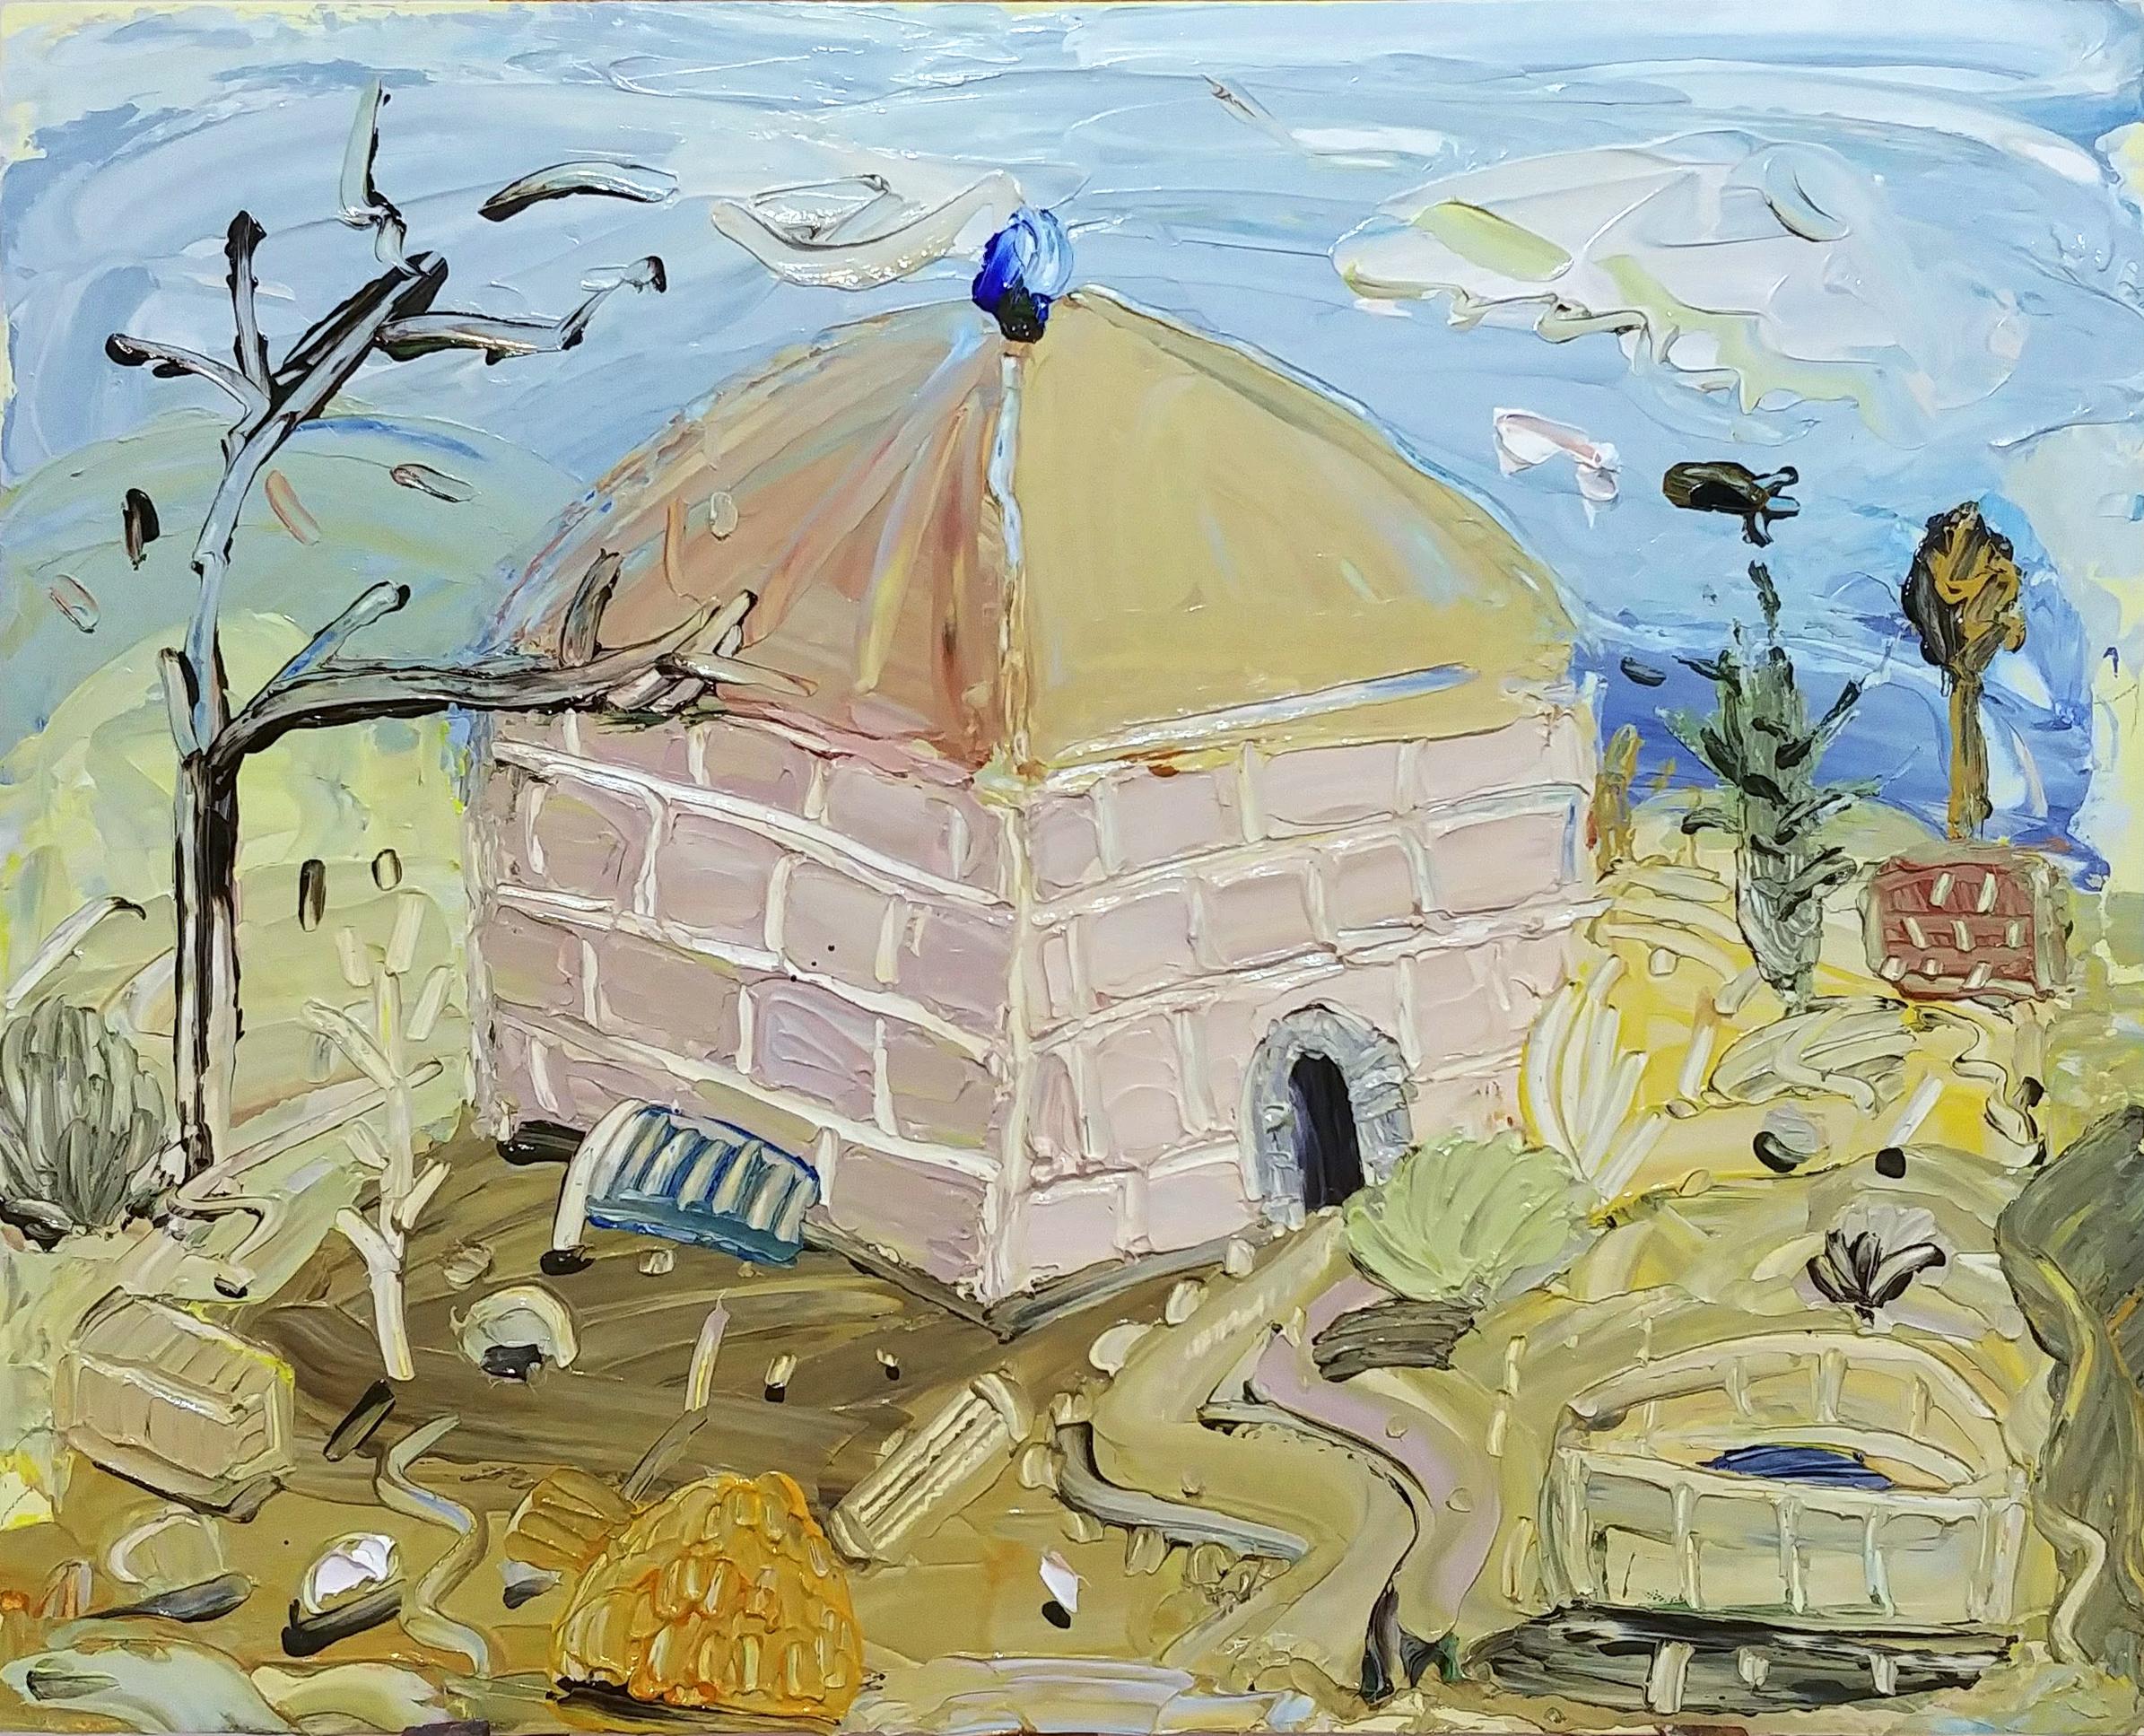 Sheikh's Grave